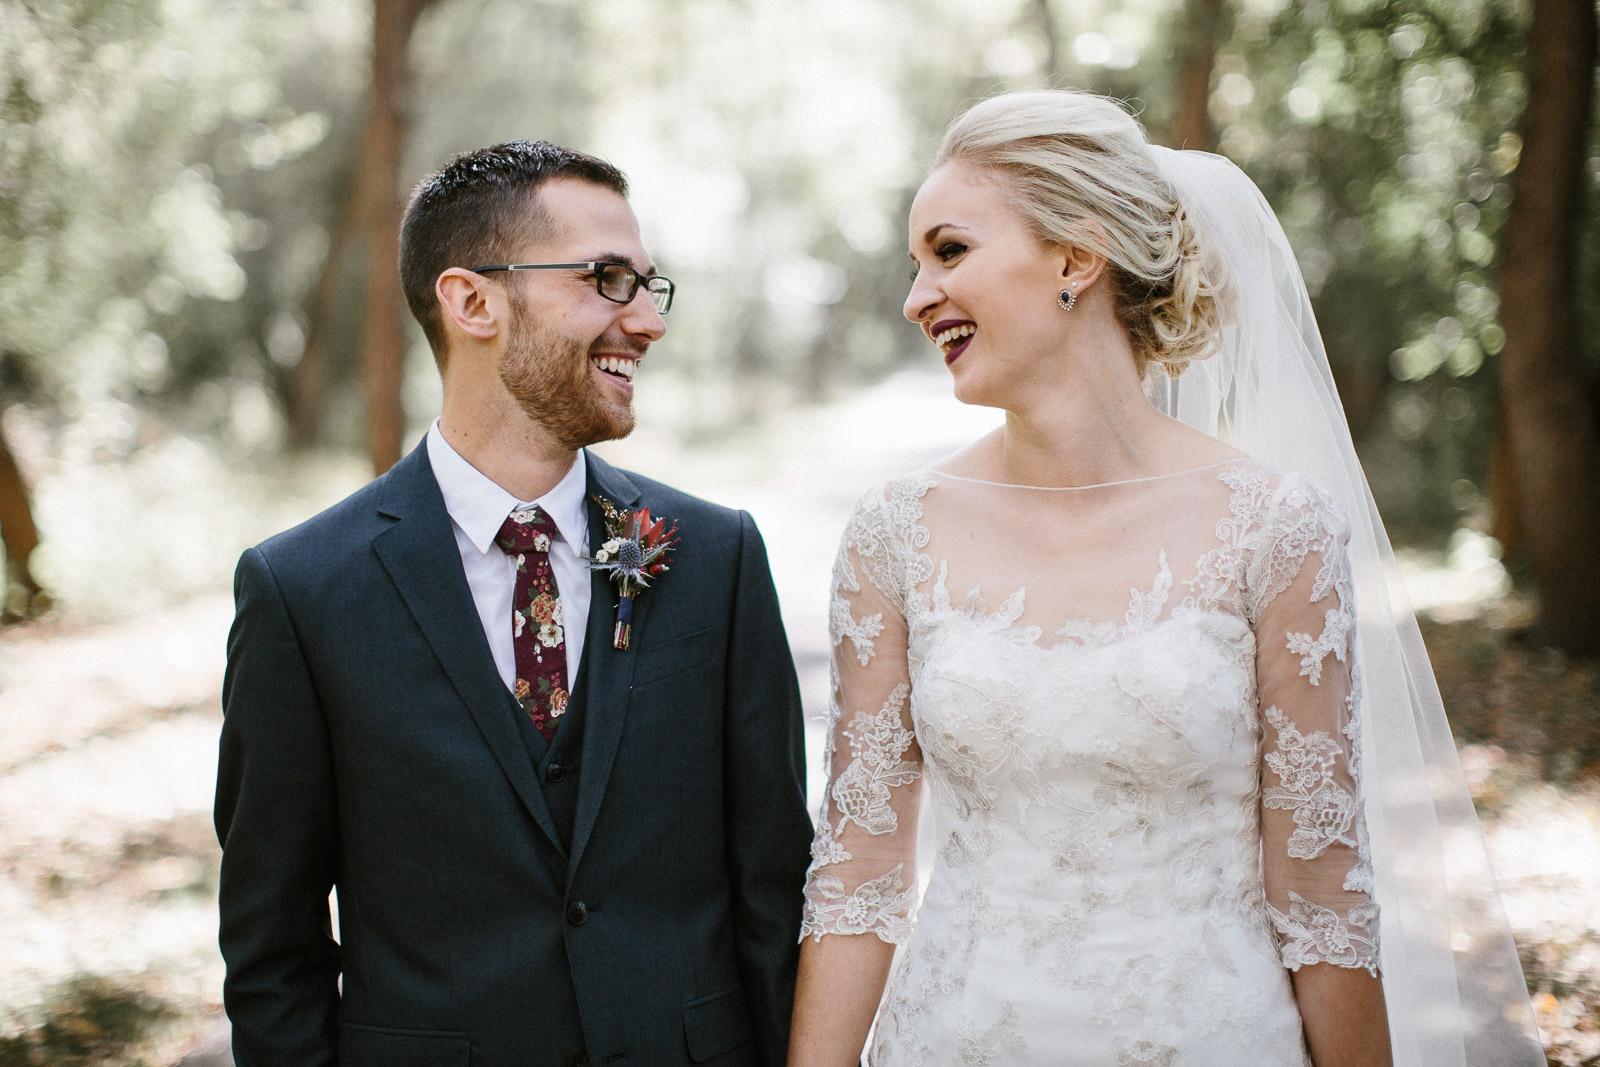 Jenna&Austin_SiouxFalls_Wedding_Photographer_041.jpg